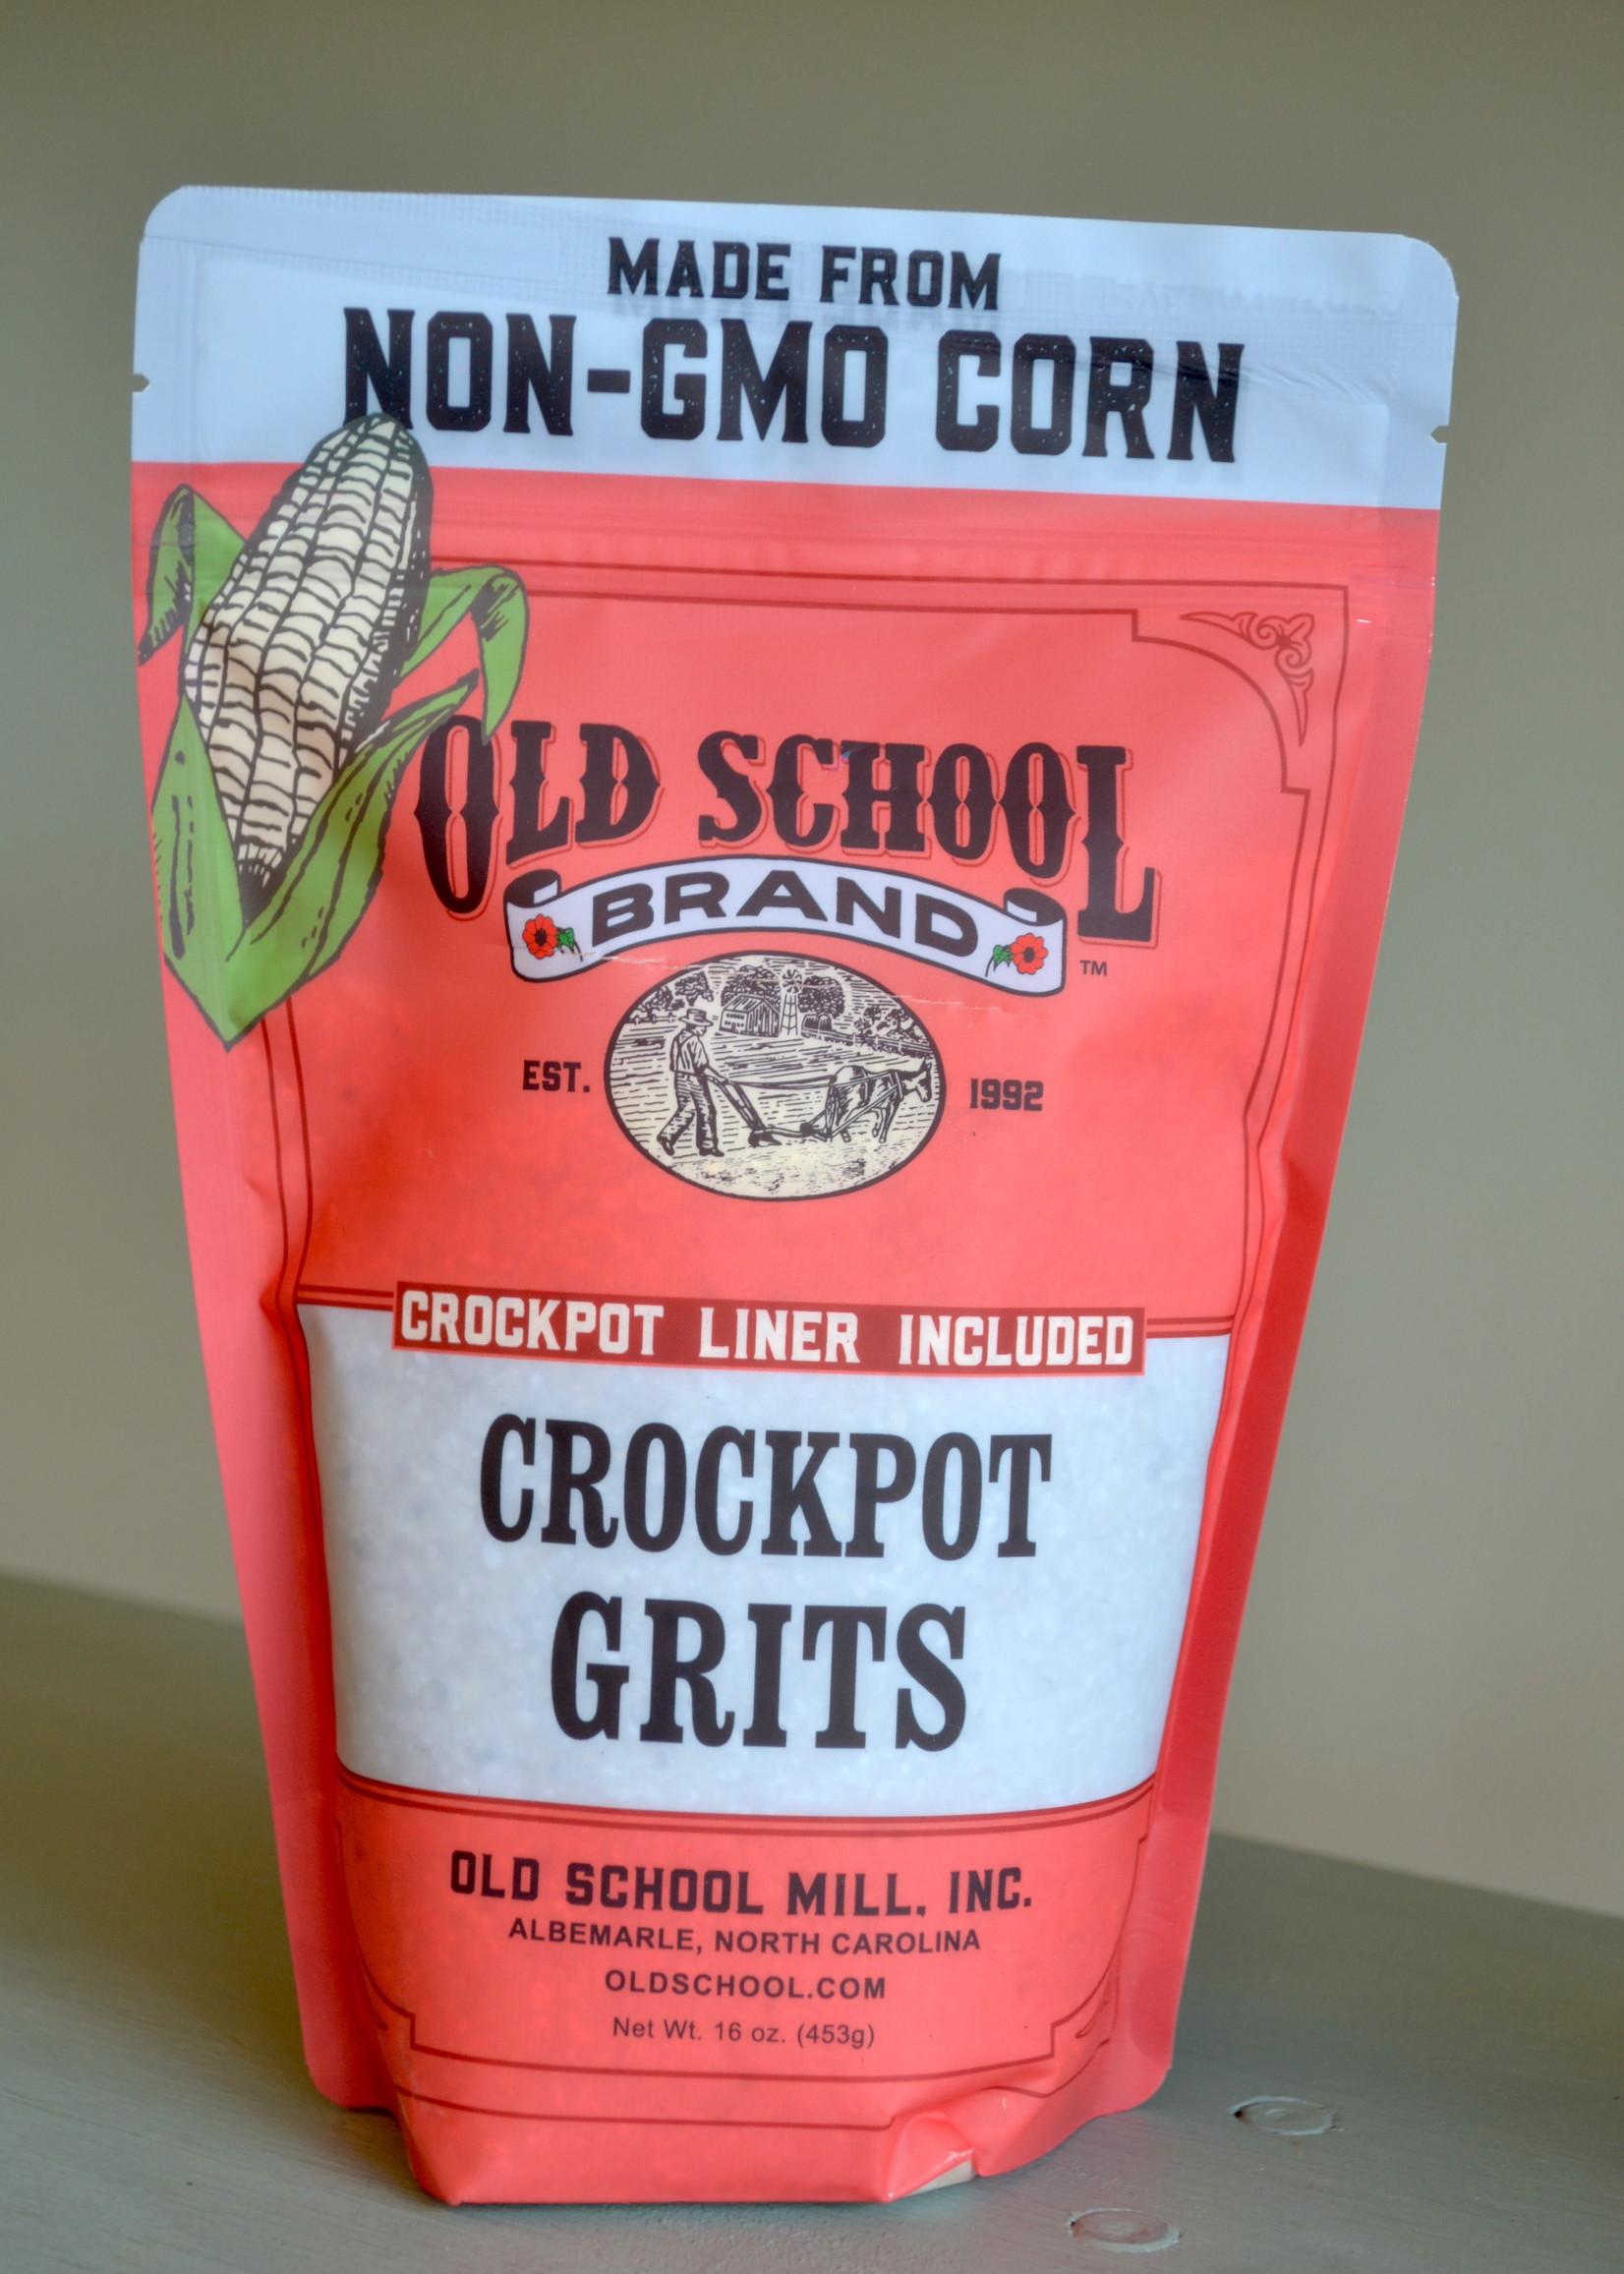 Old School Mill Old School Crockpot Grits